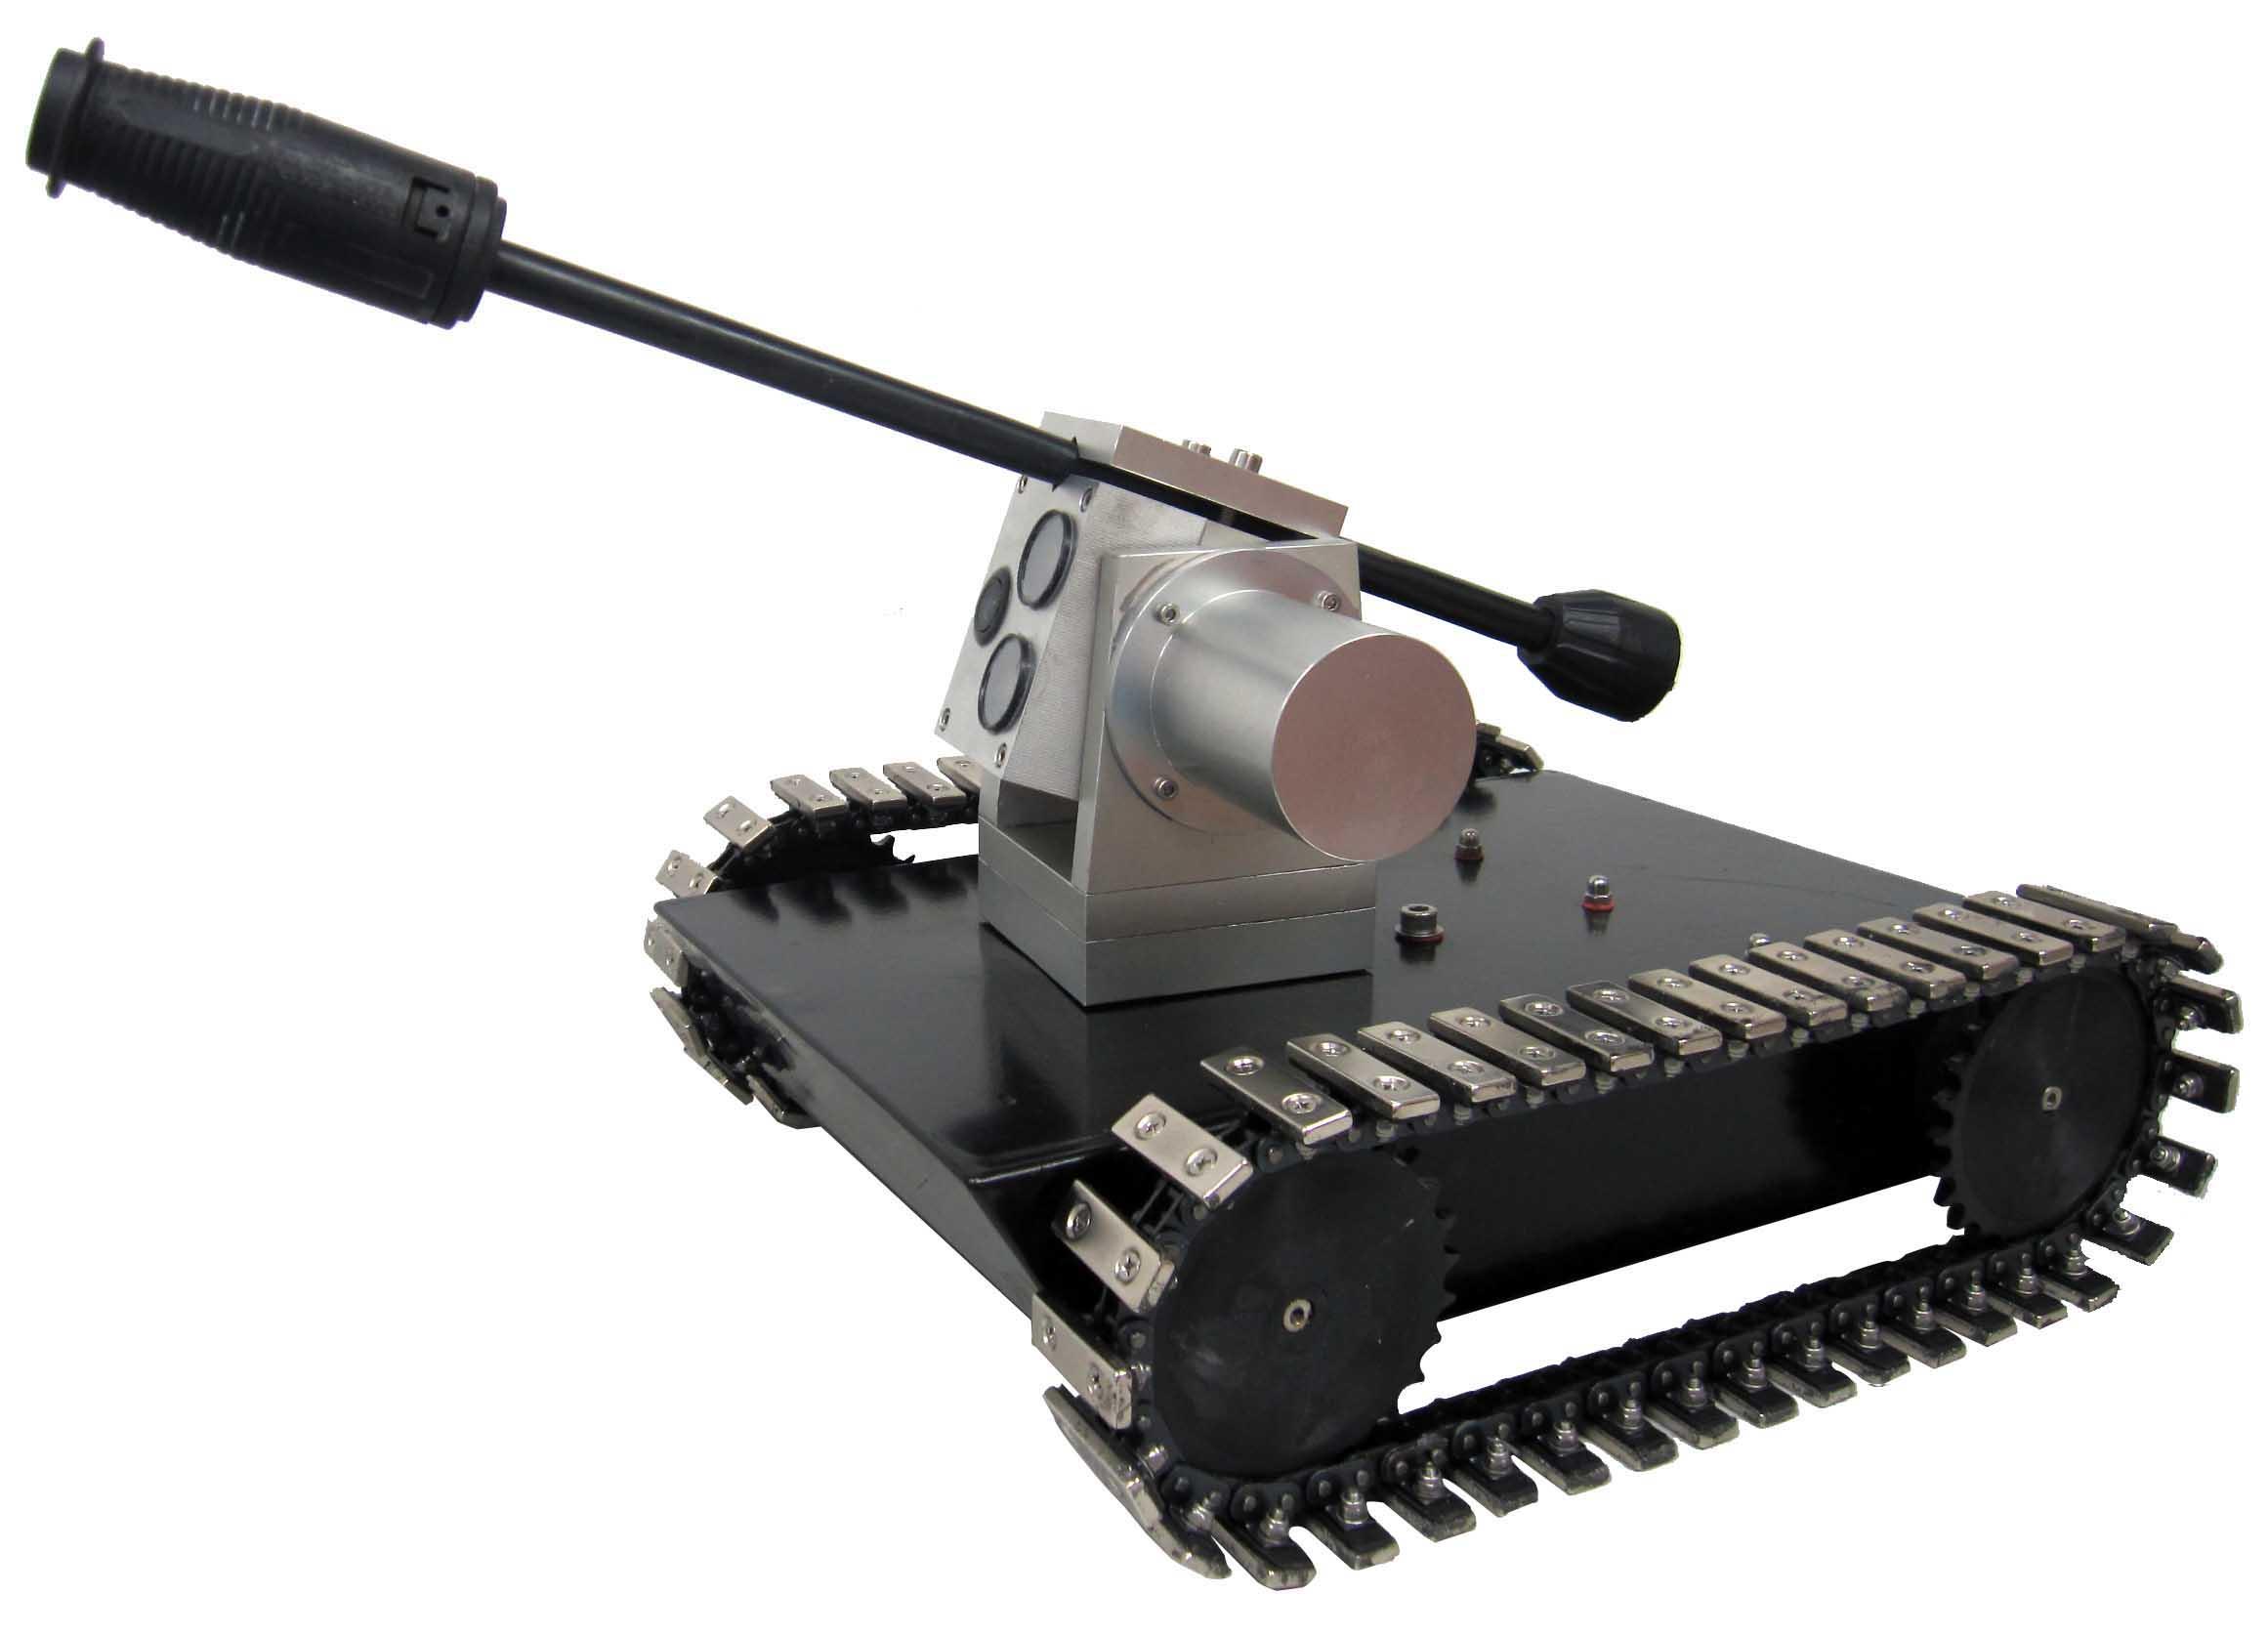 FB606 油烟管道清洗与检测机器人